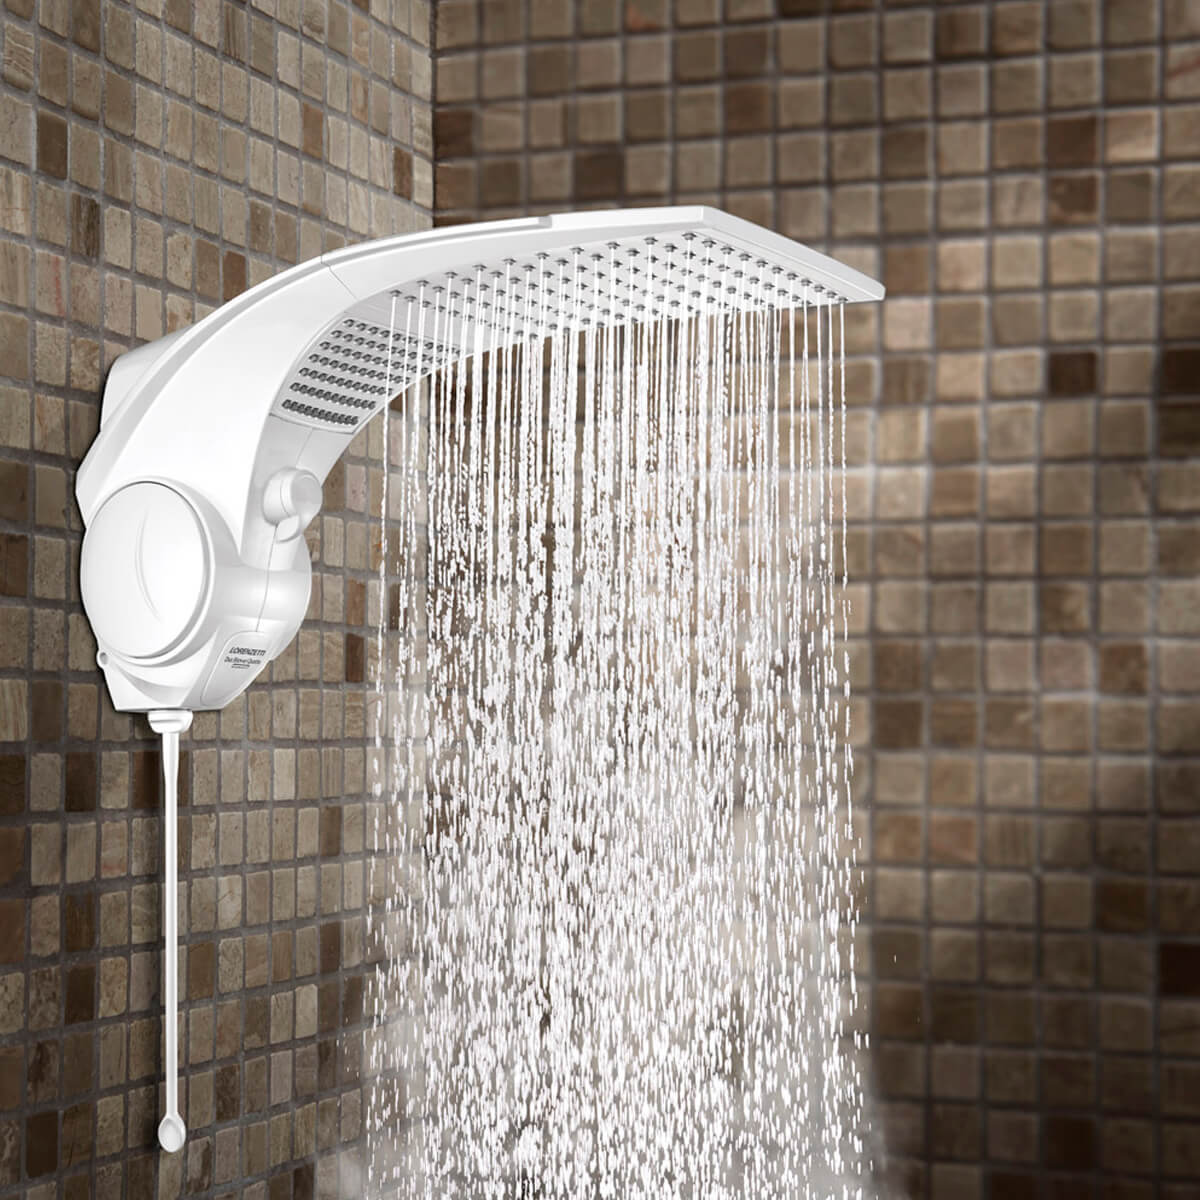 Chuveiro Ducha Duo Shower Quadra Eletrônica 220V 7500W Lorenzetti